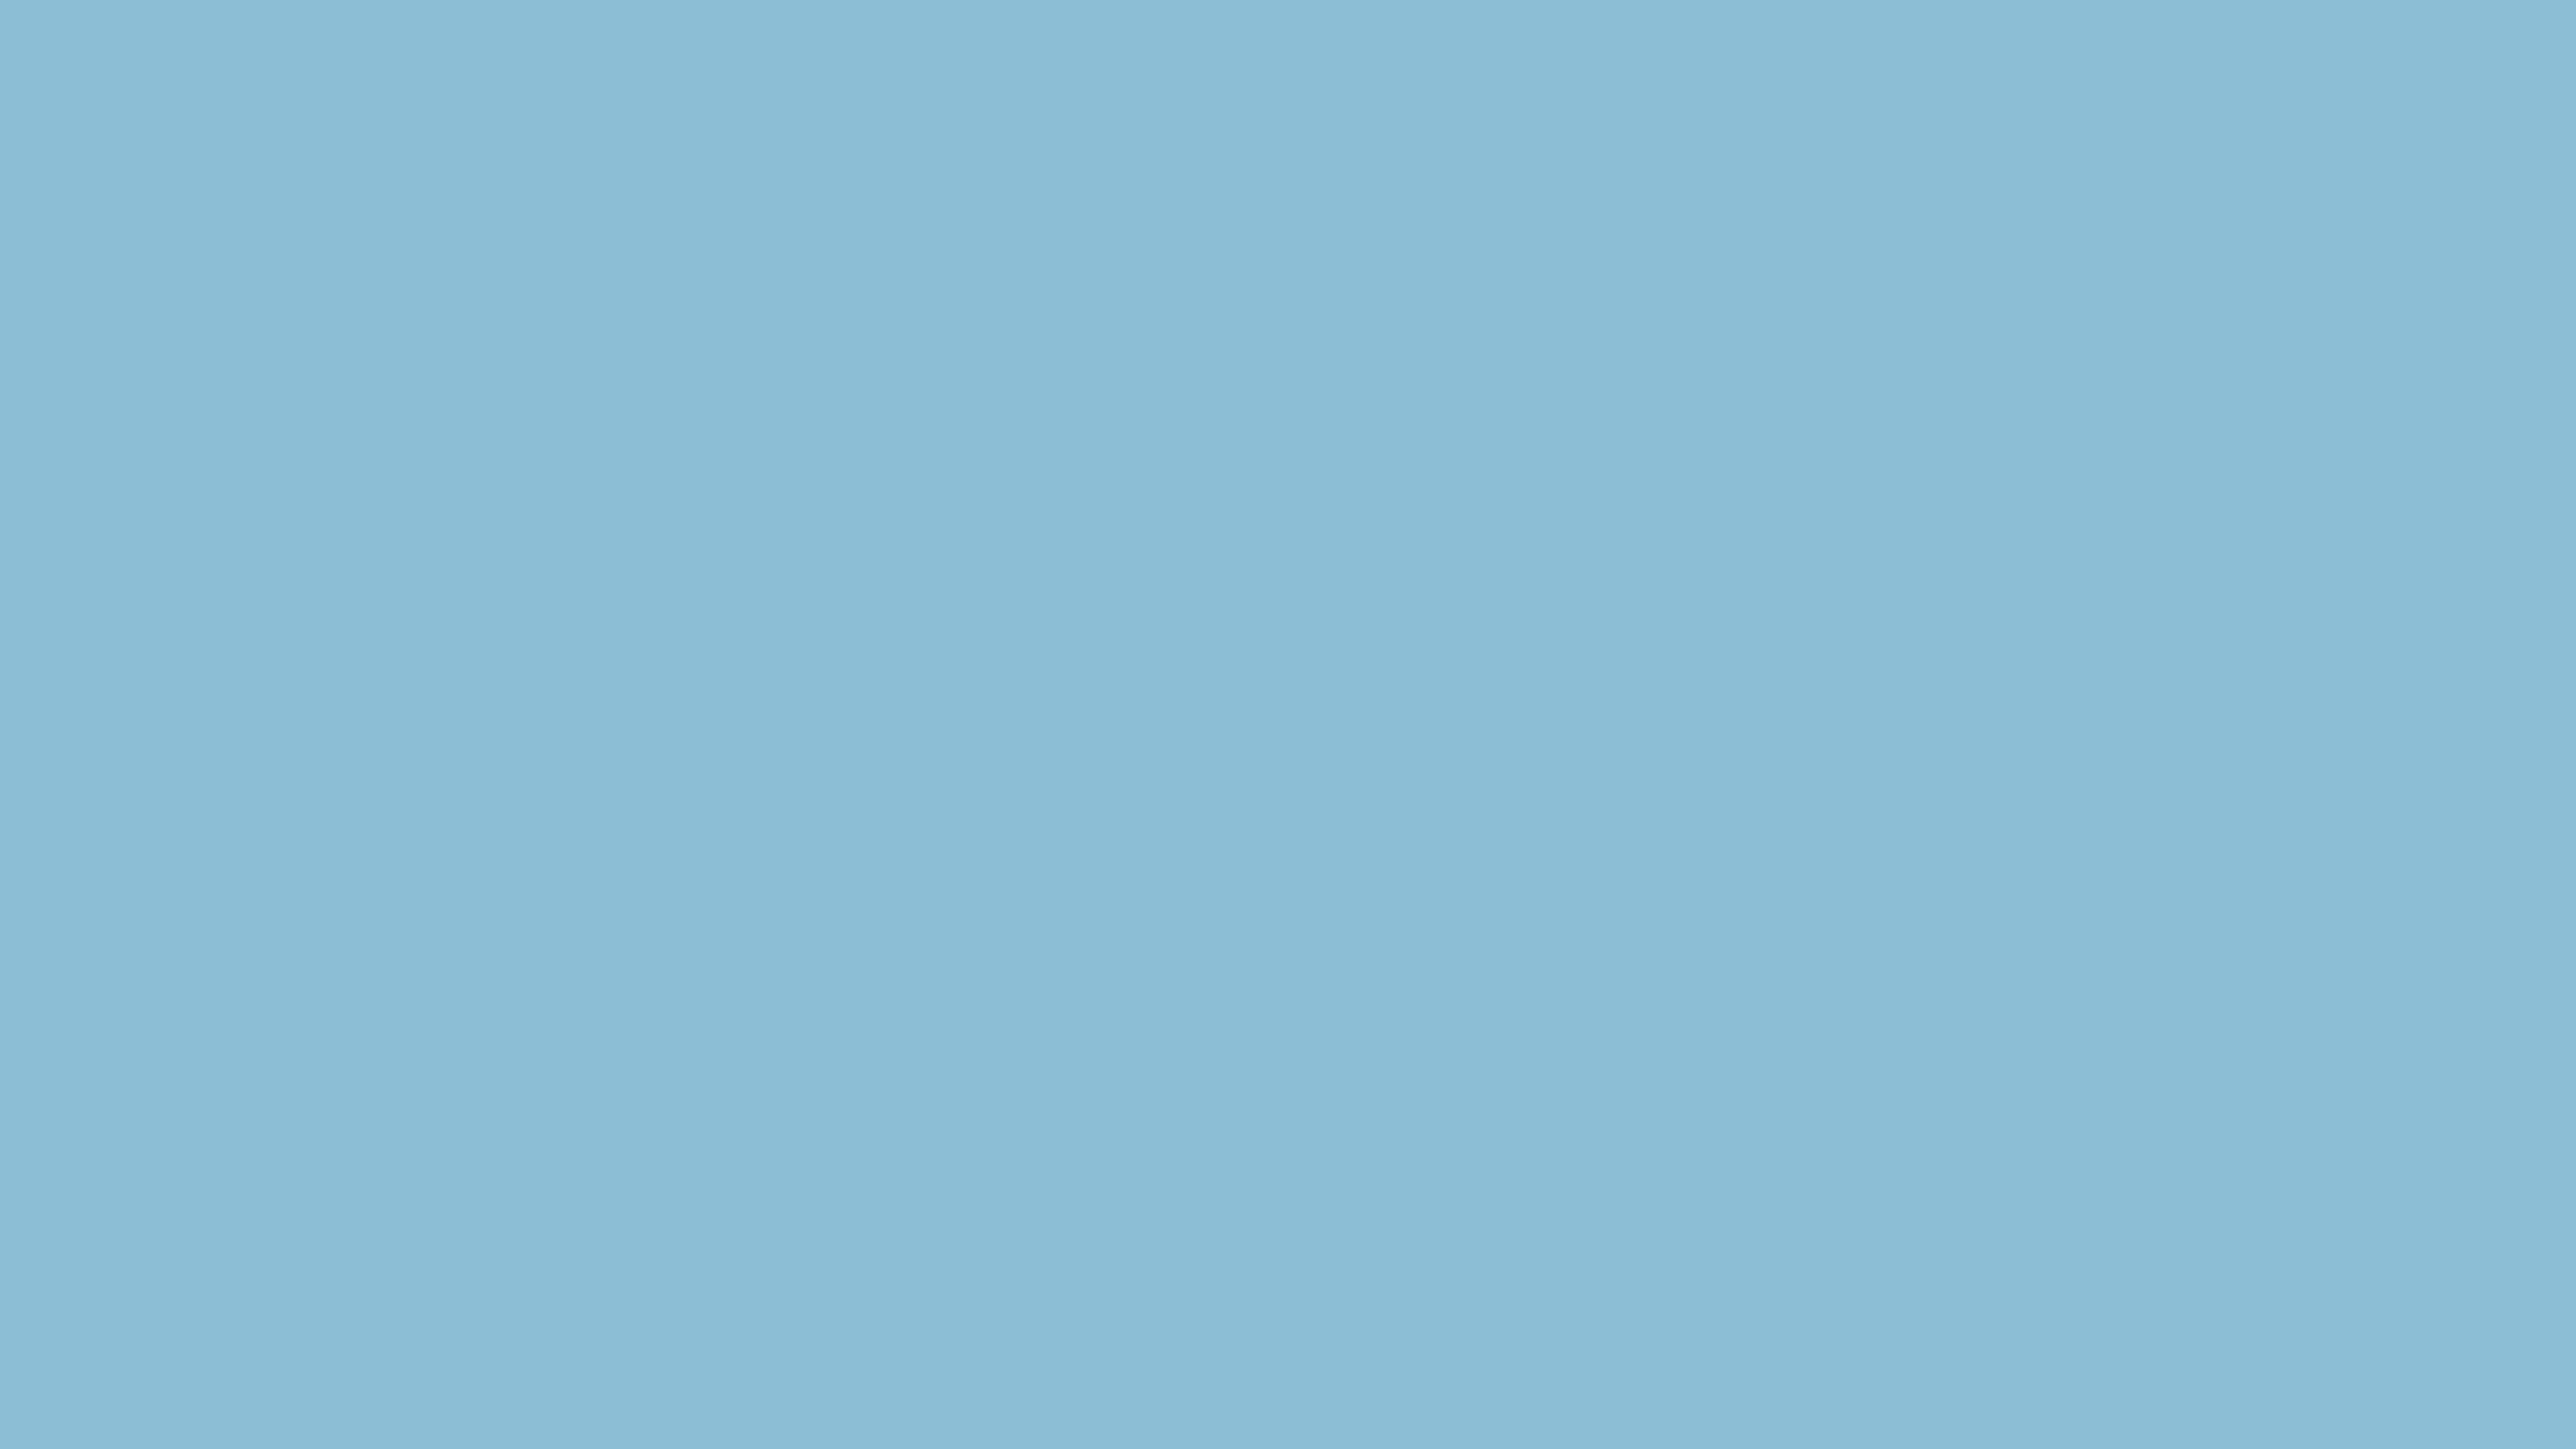 3840x2160 Dark Sky Blue Solid Color Background